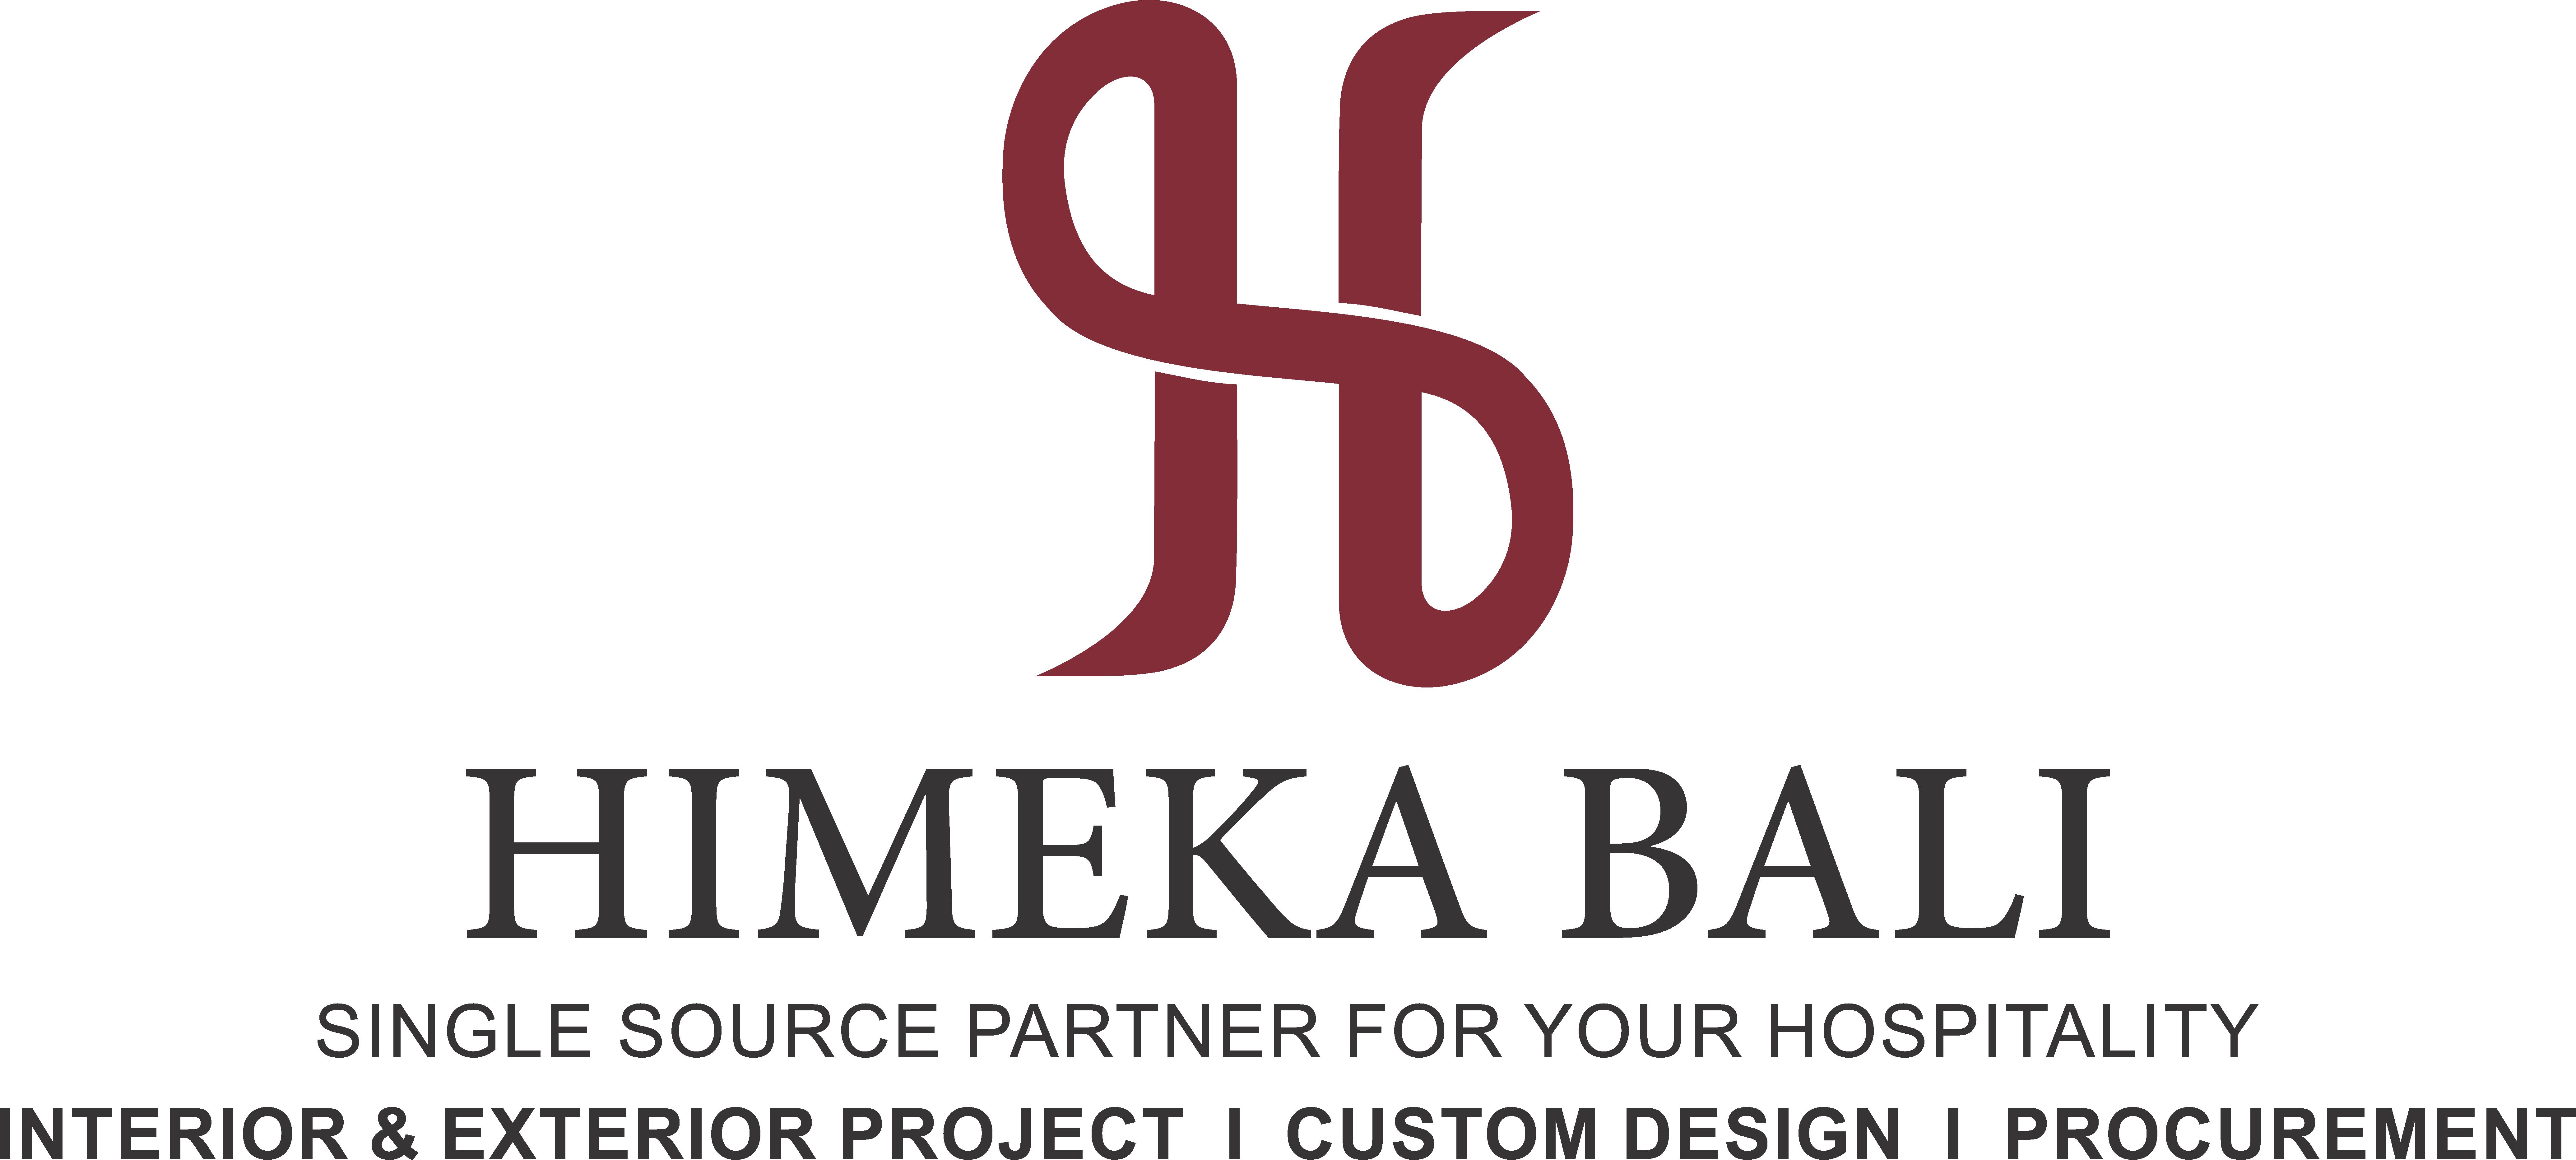 Himeka Bali